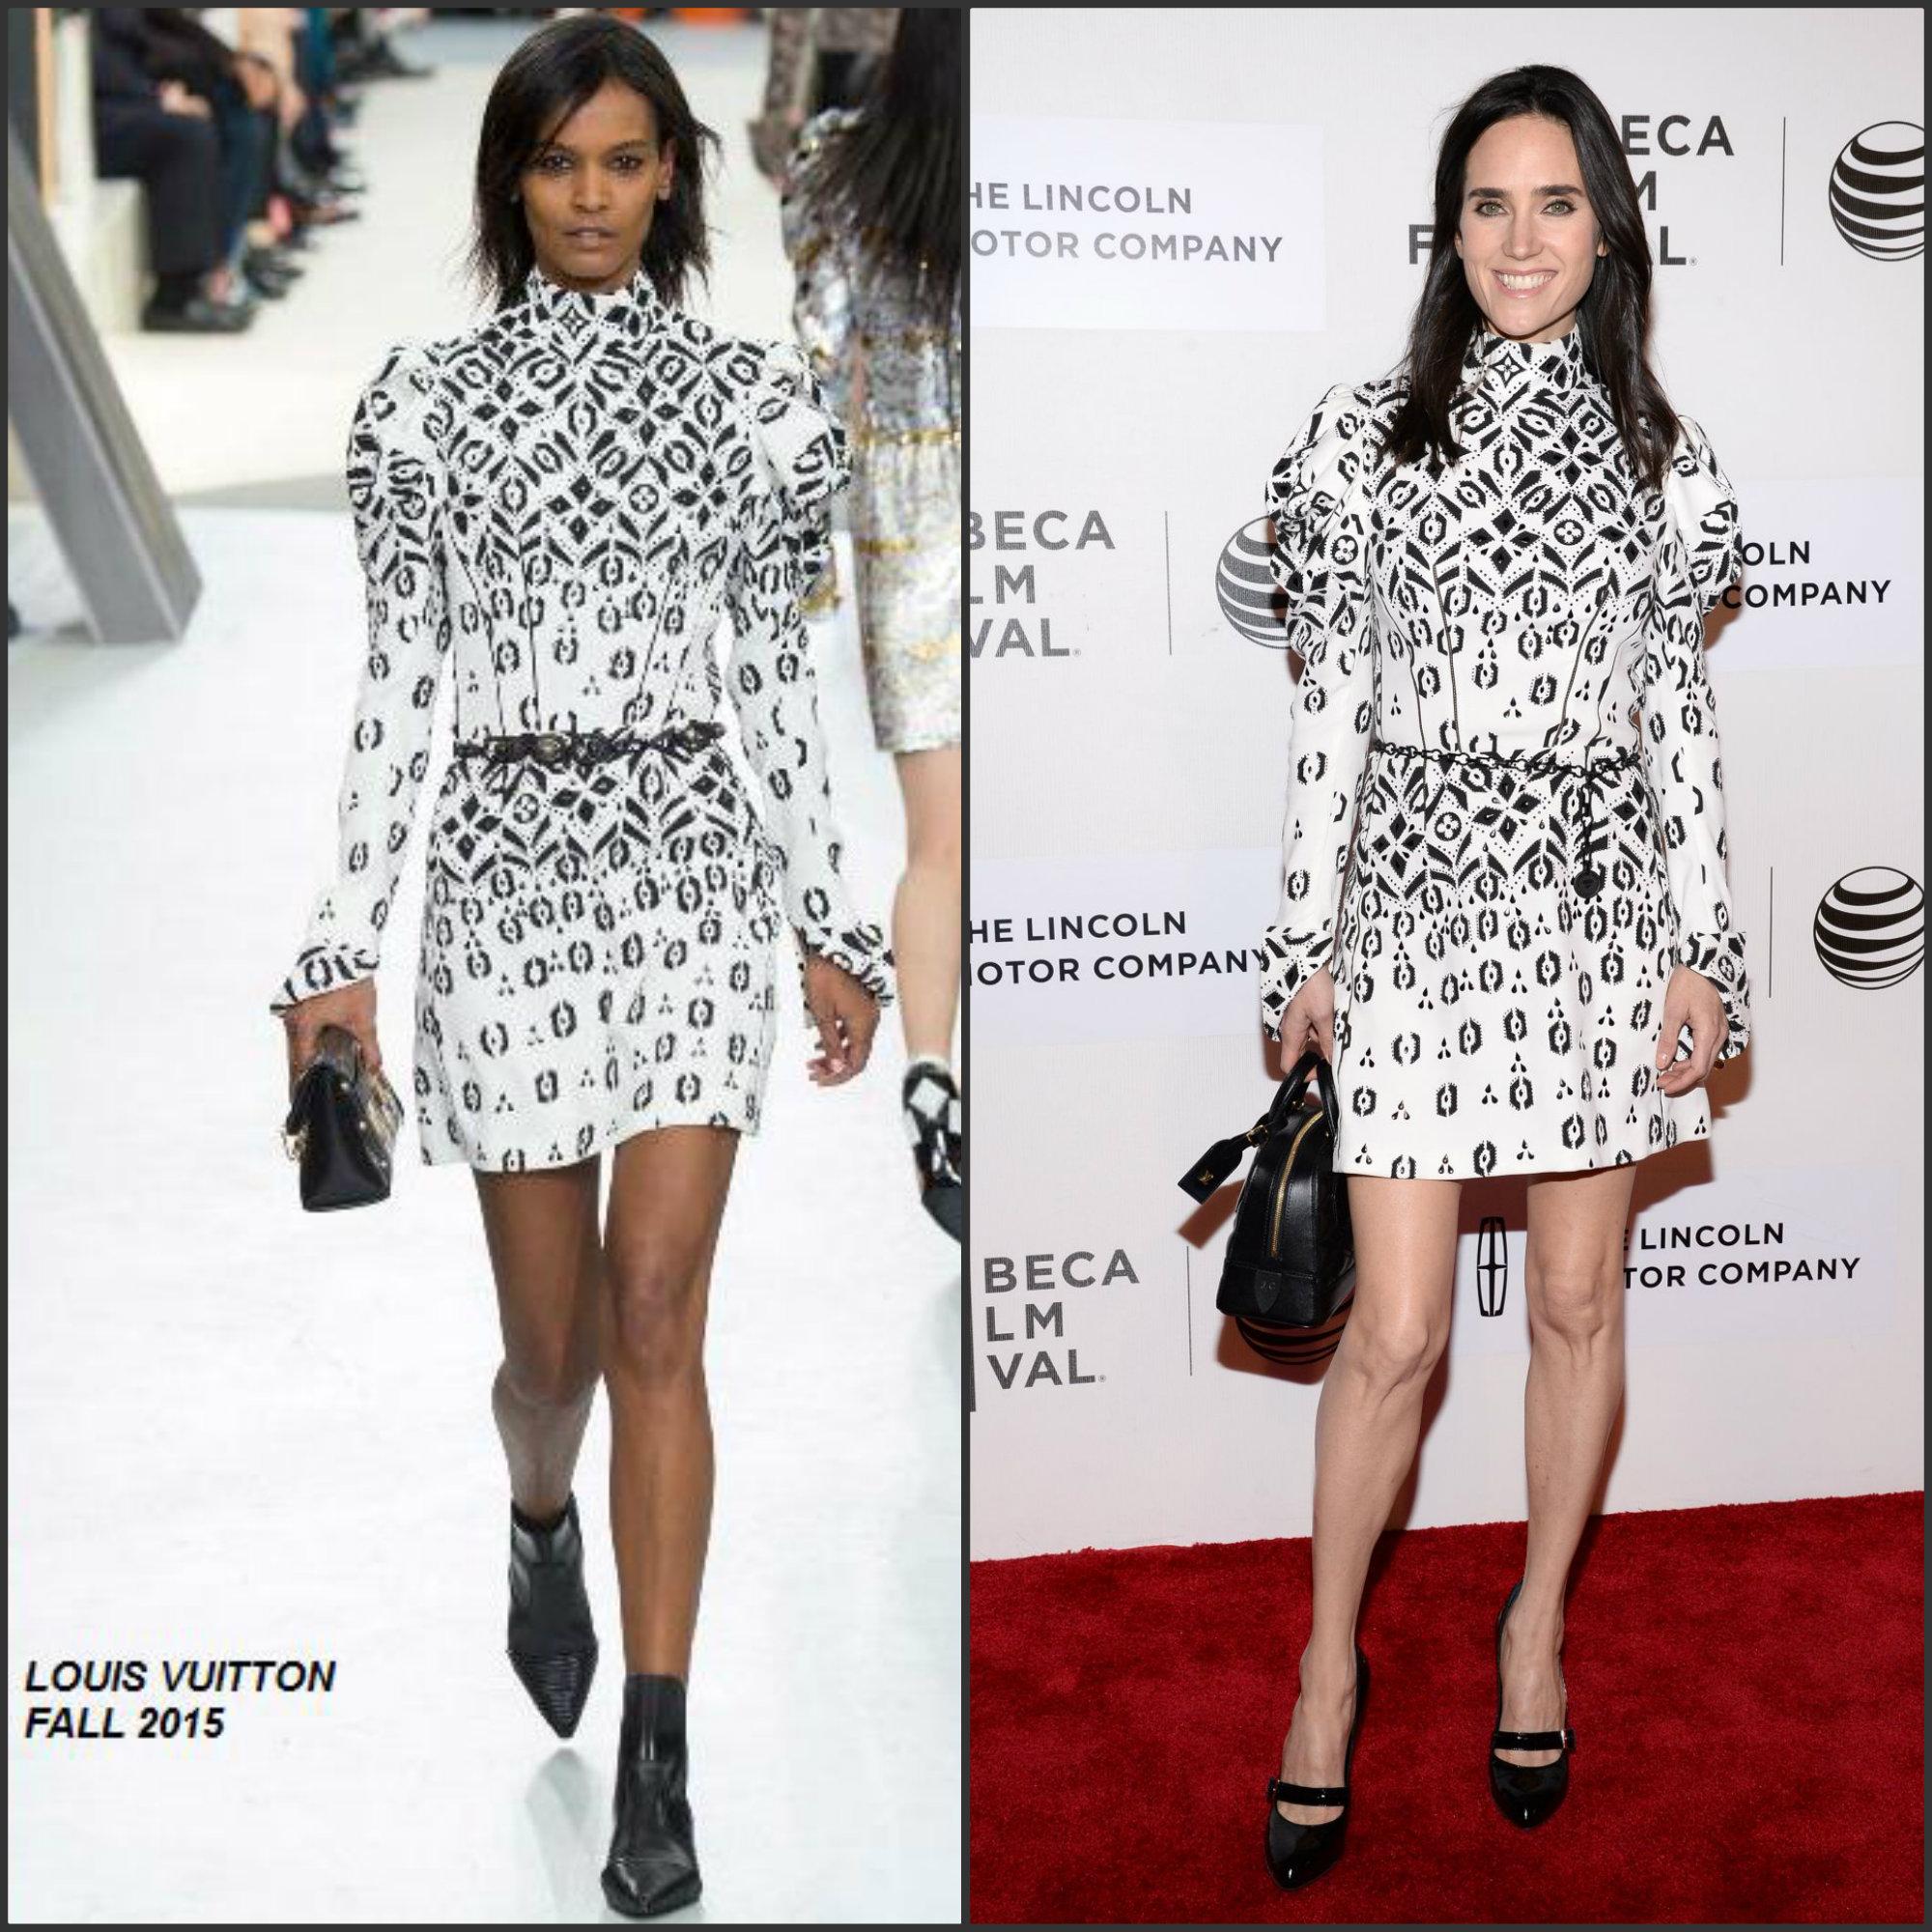 Jennifer-Connelly-in-Louis-Vuitton-Alot-Premiere-2015-Tribeca-Film-Festival